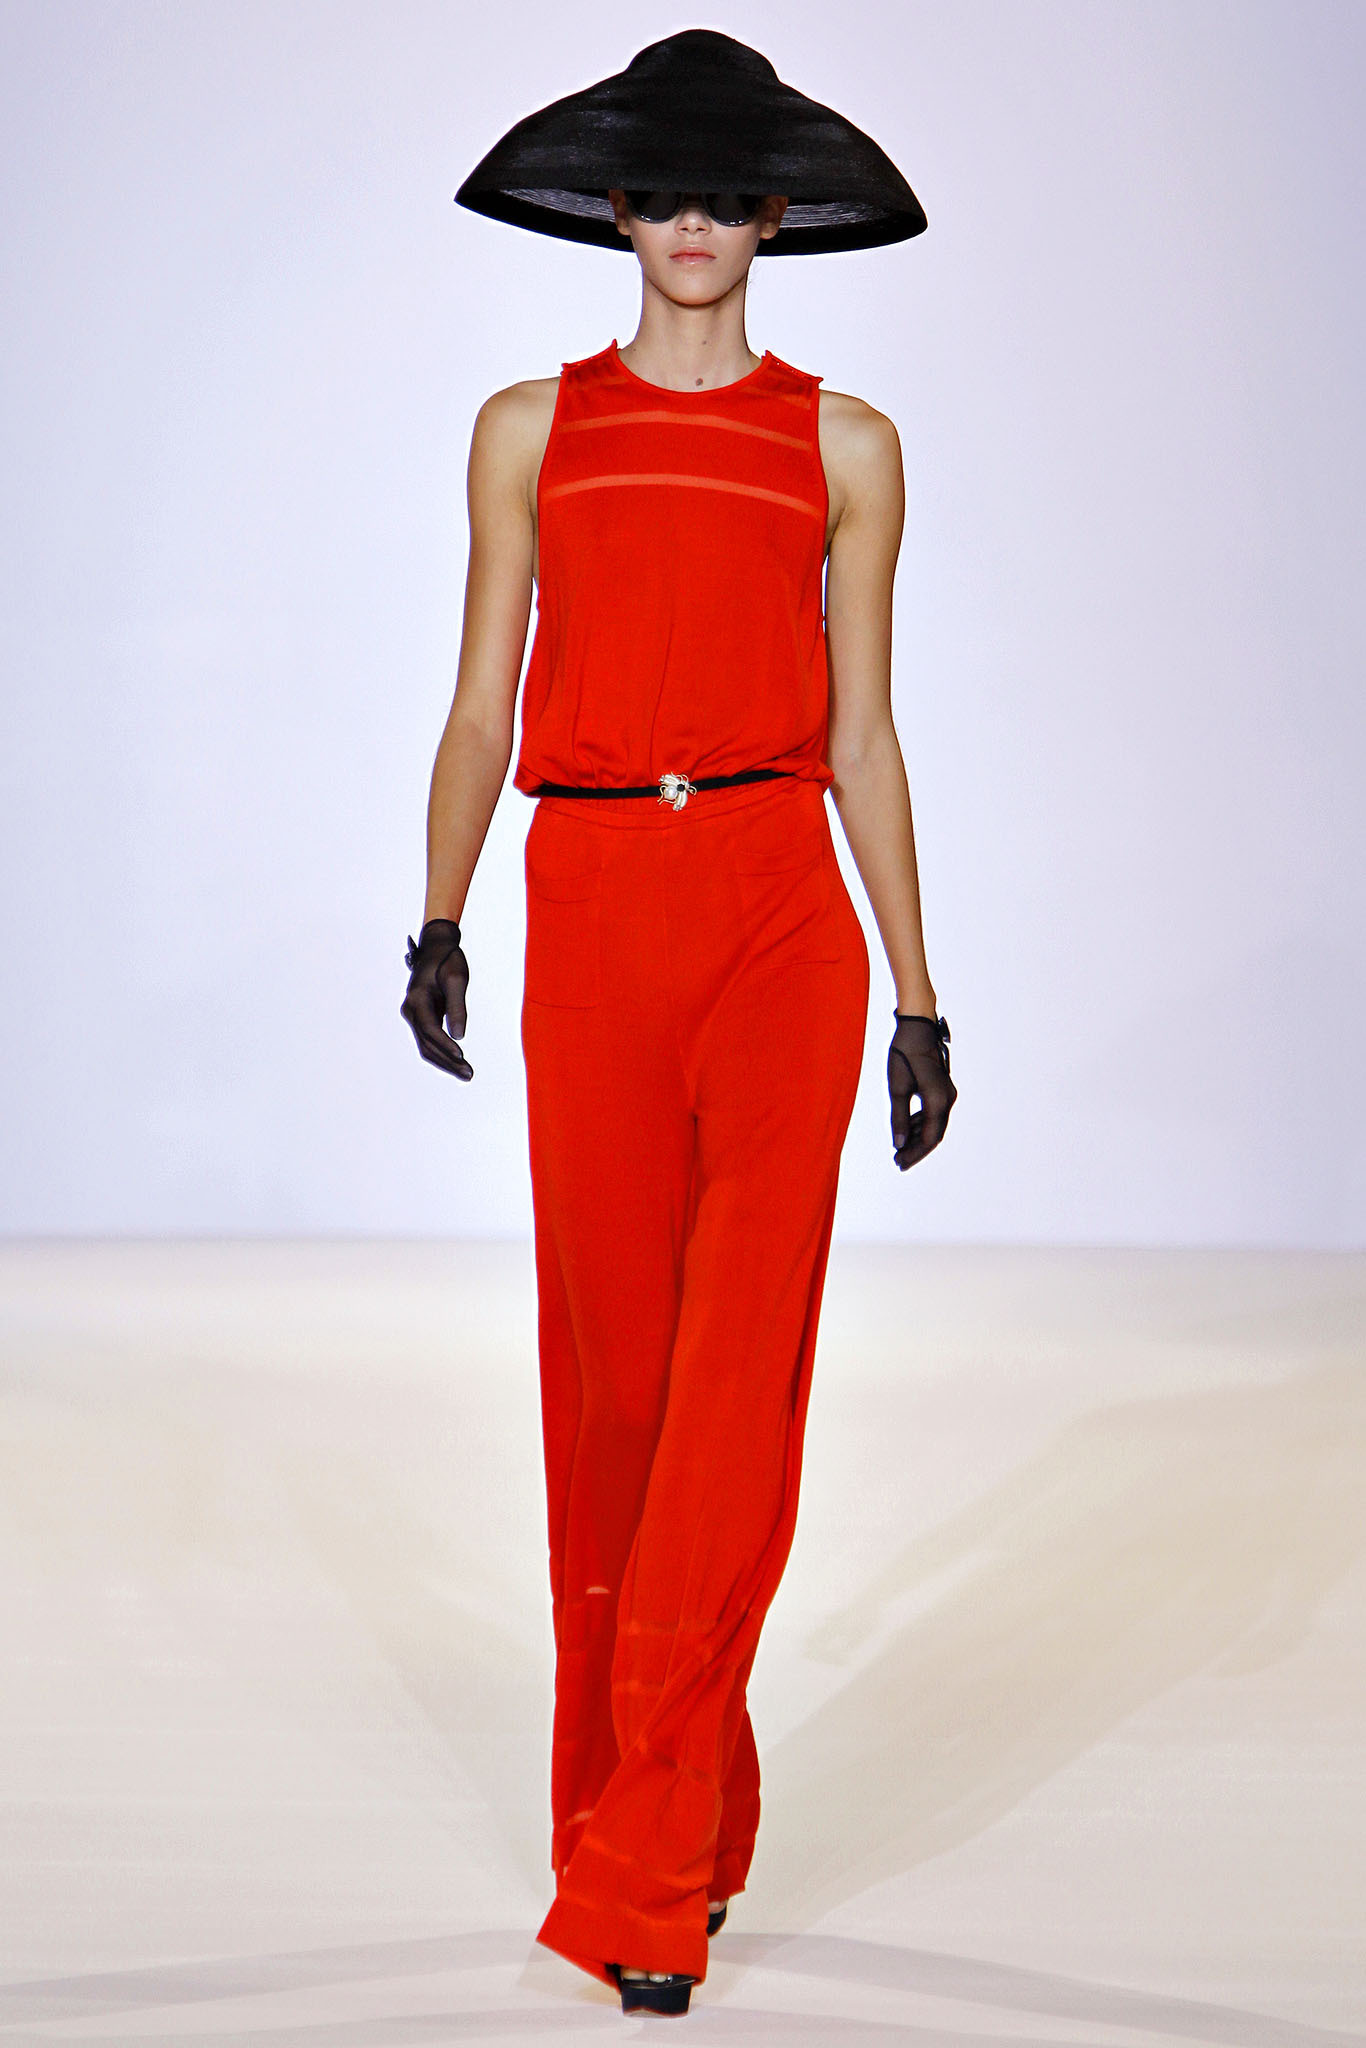 Temperley London - London Fashion Week, 2013 Spring